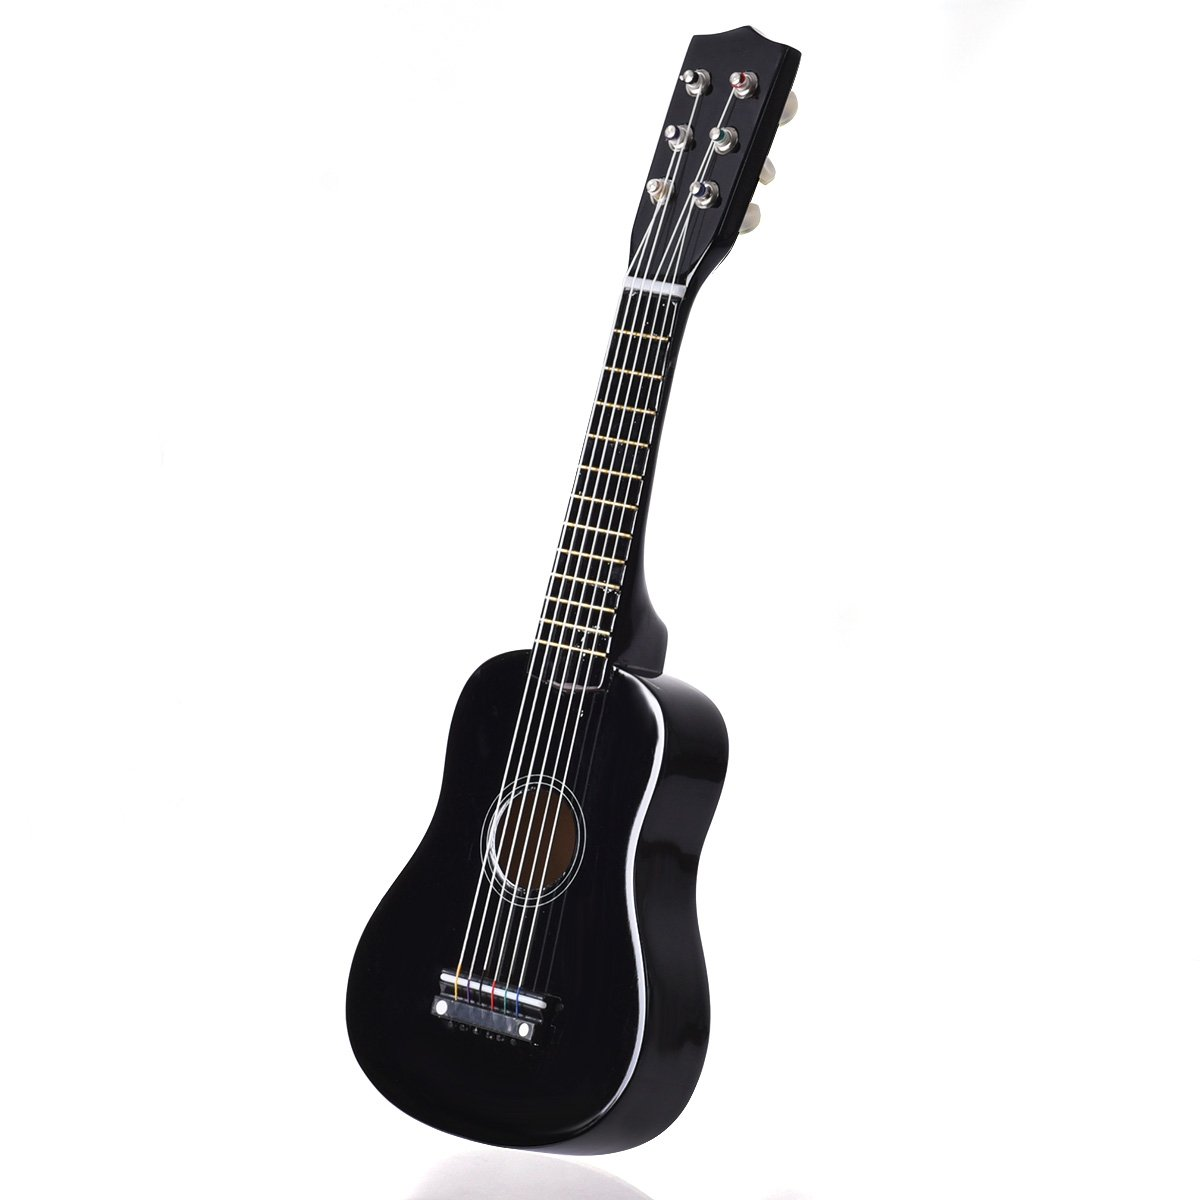 Goplus 21 Beginners Kids Acoustic Guitar 6 String with Pick Children Kids Musical Gift (Black) Superbuy